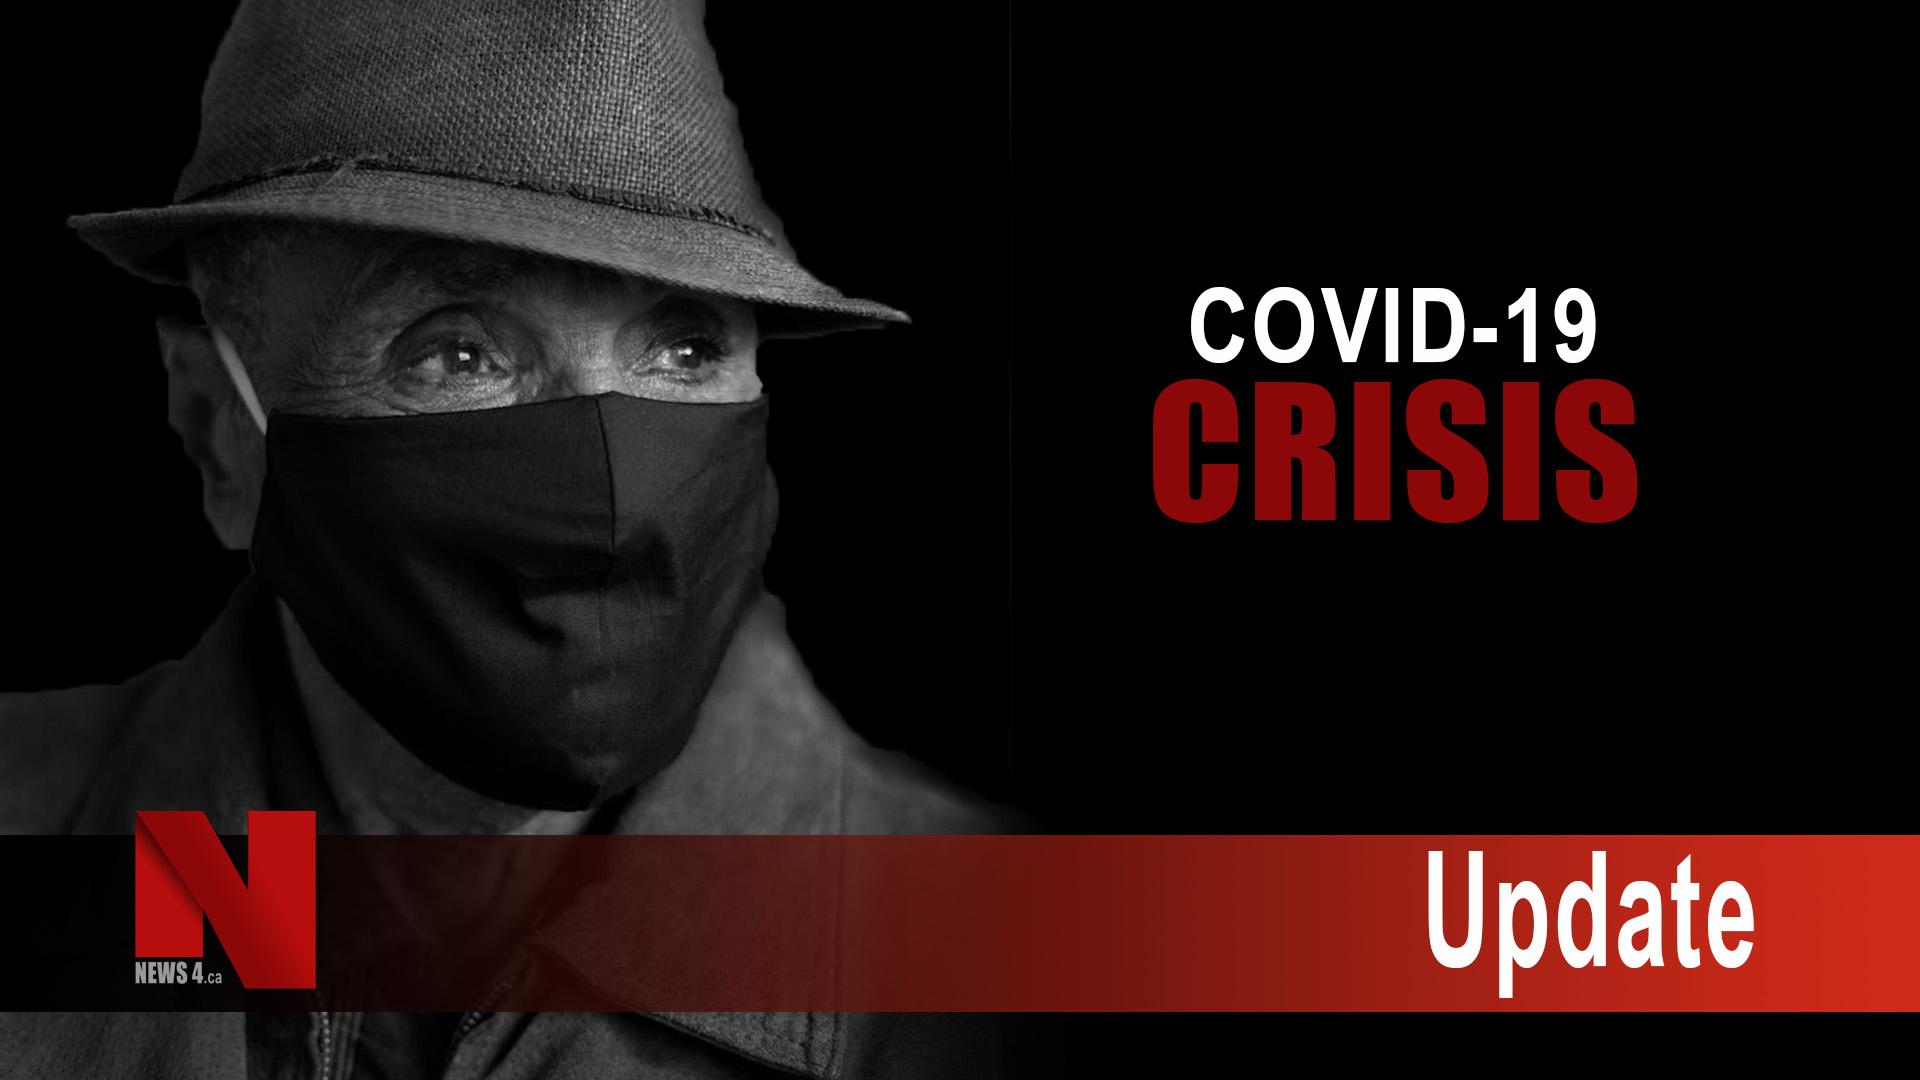 COVID CRISIS Update